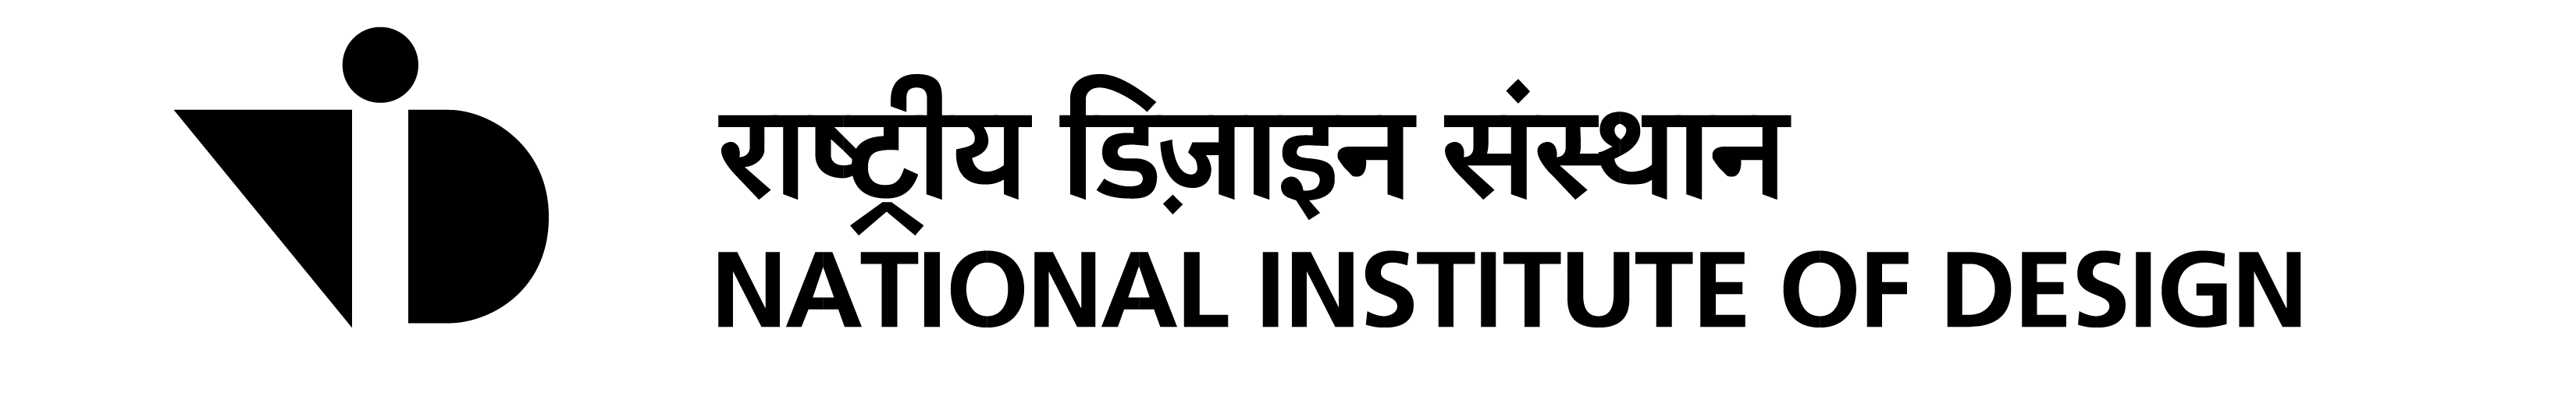 nid_logo